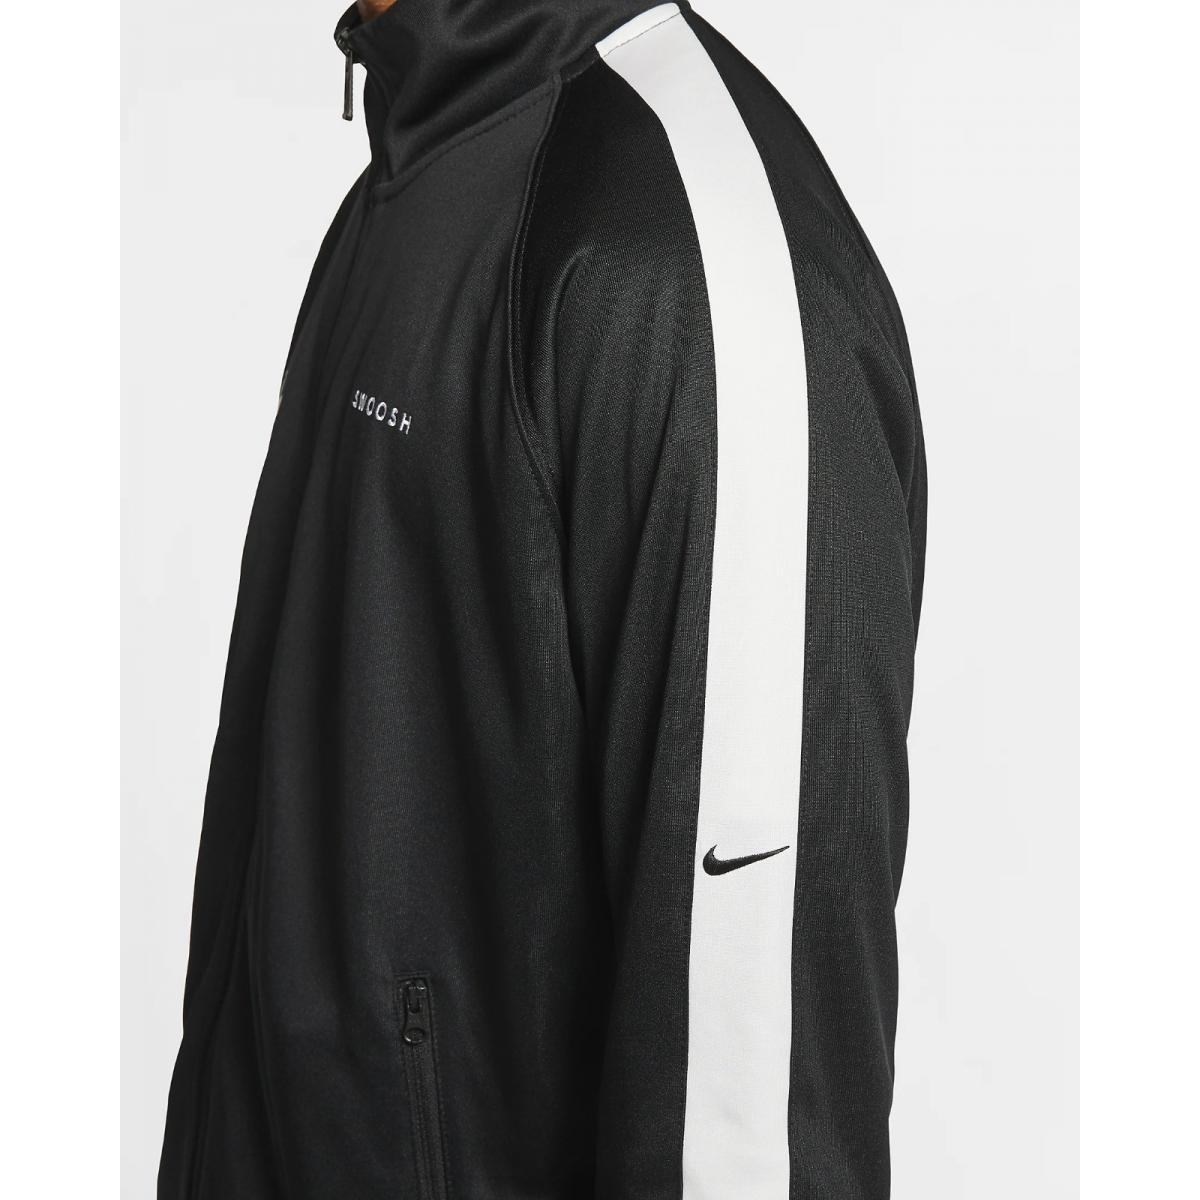 Giacca sportiva Nike Sportswear Swoosh con logo da uomo rif. CJ4884